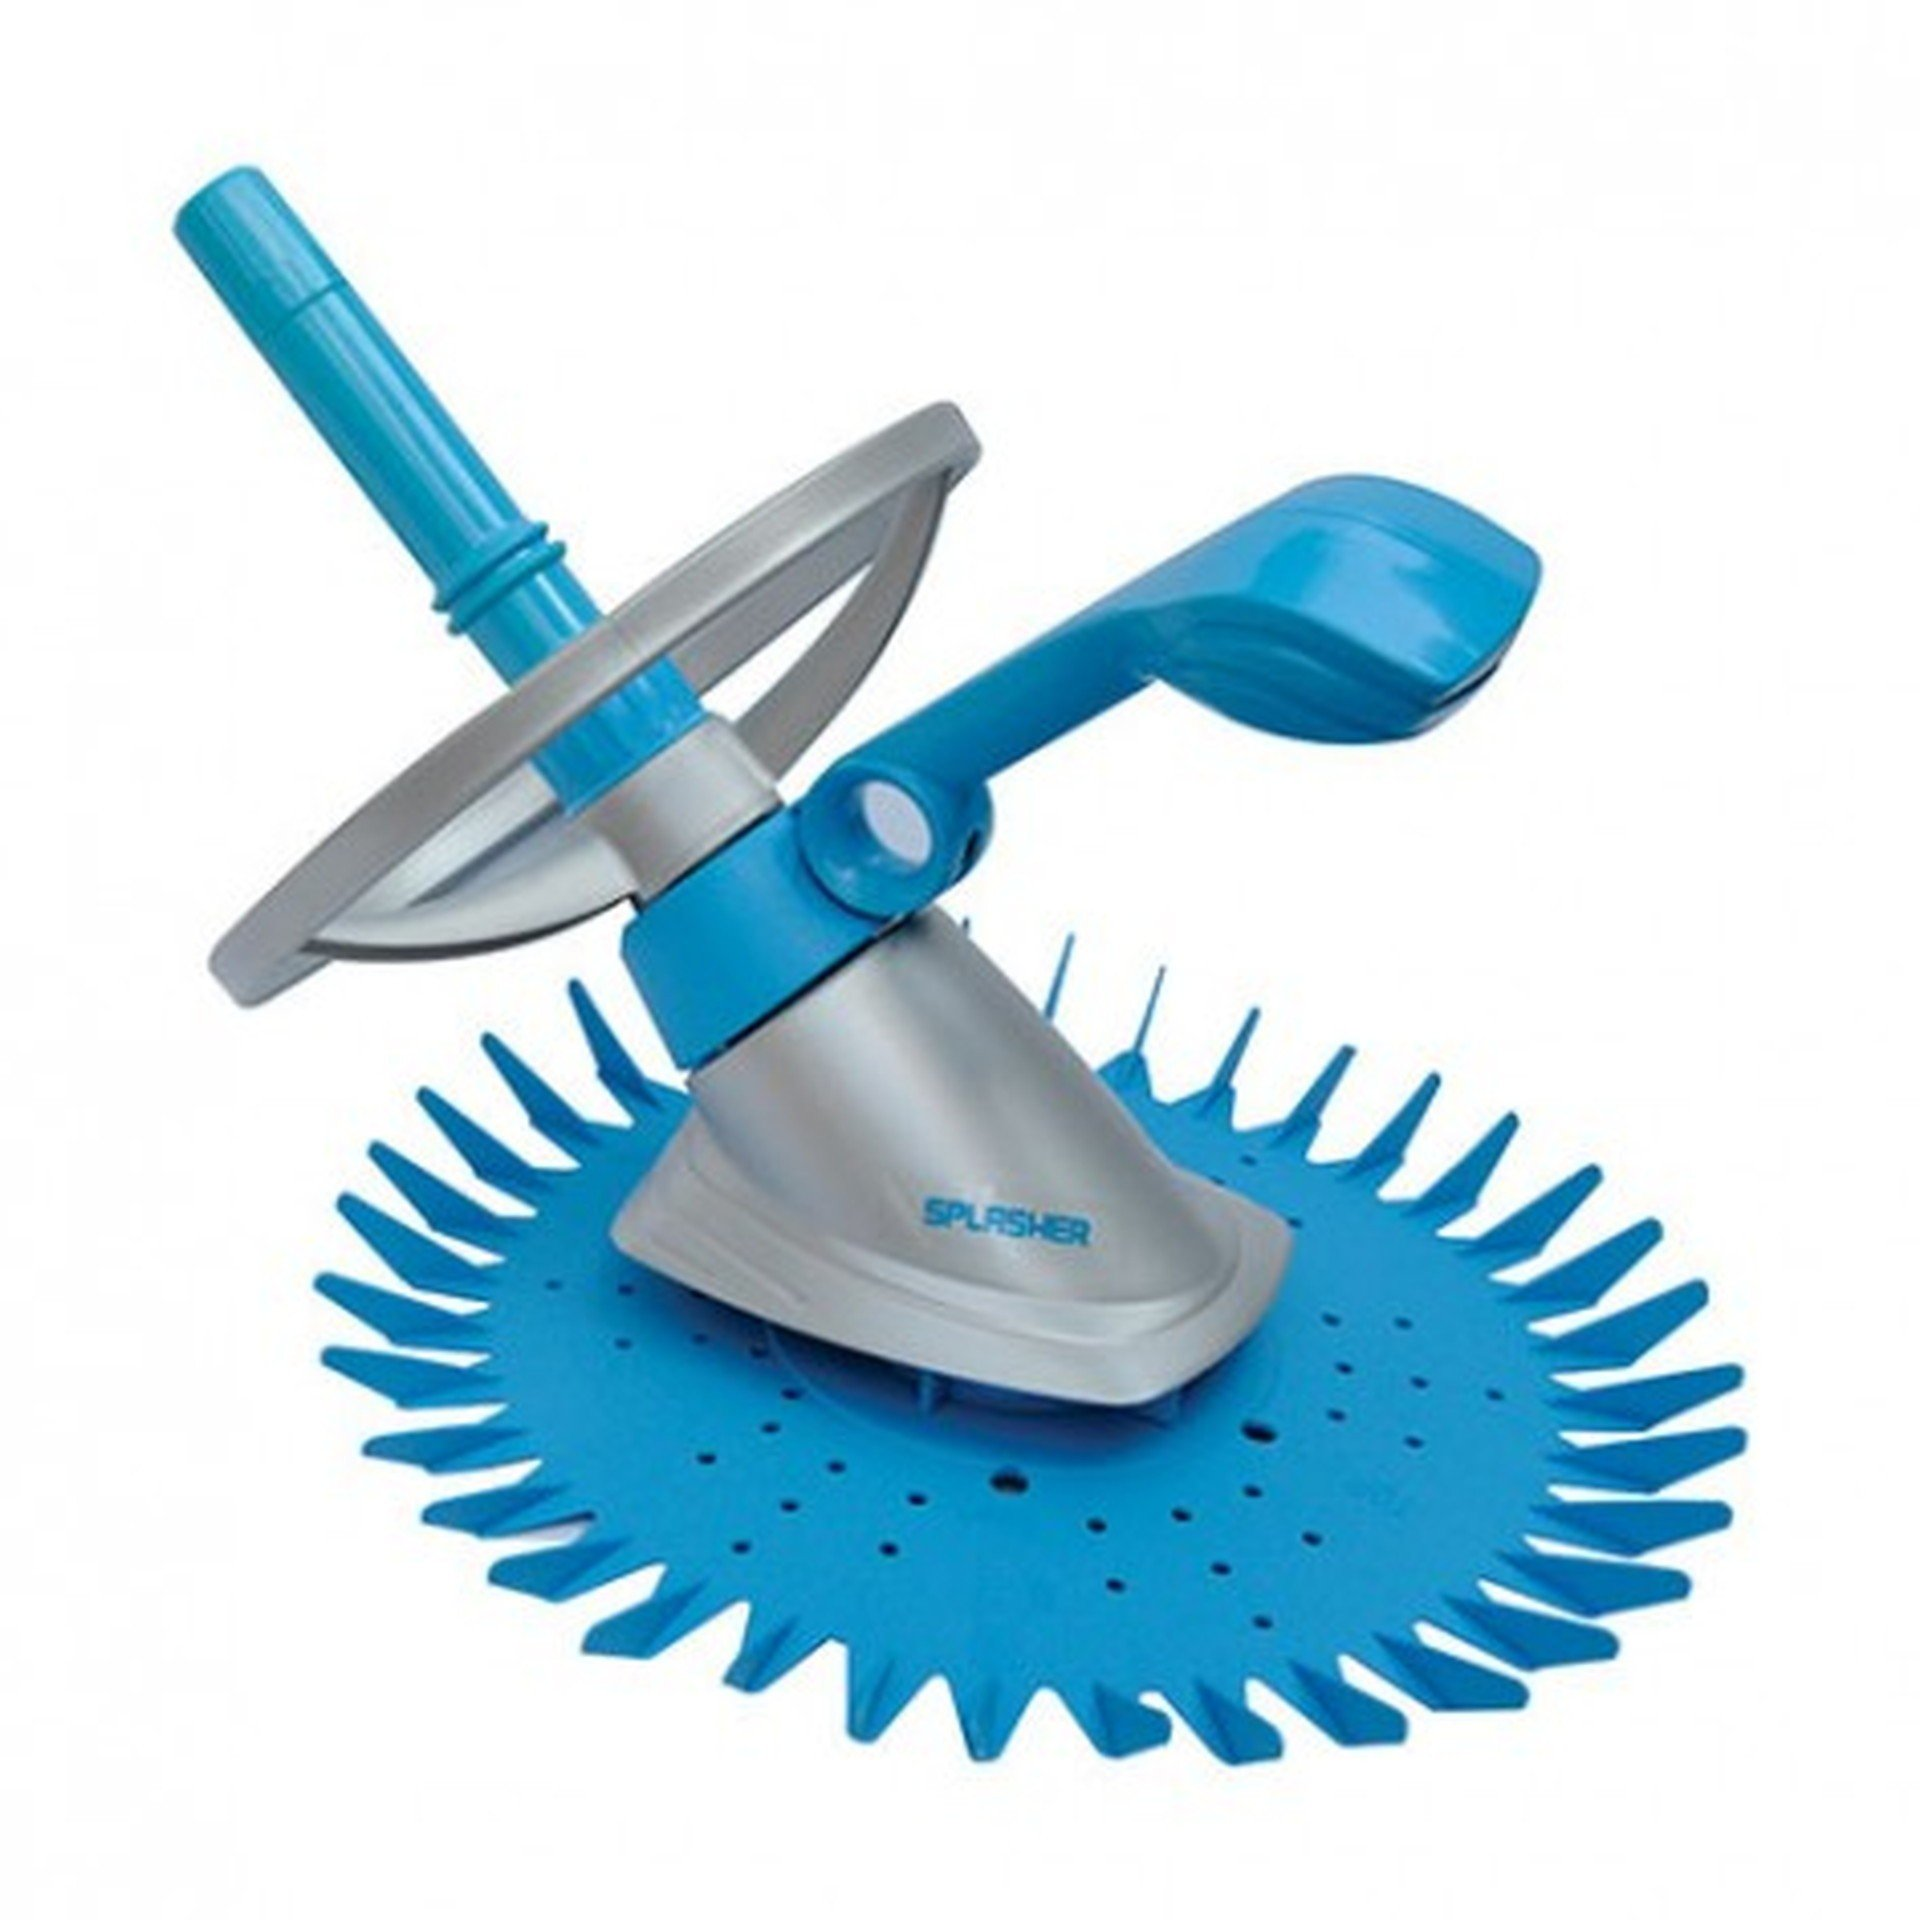 Fluidra 66281-Limpiafondos Automático Splasher, Blanco/Azul ...